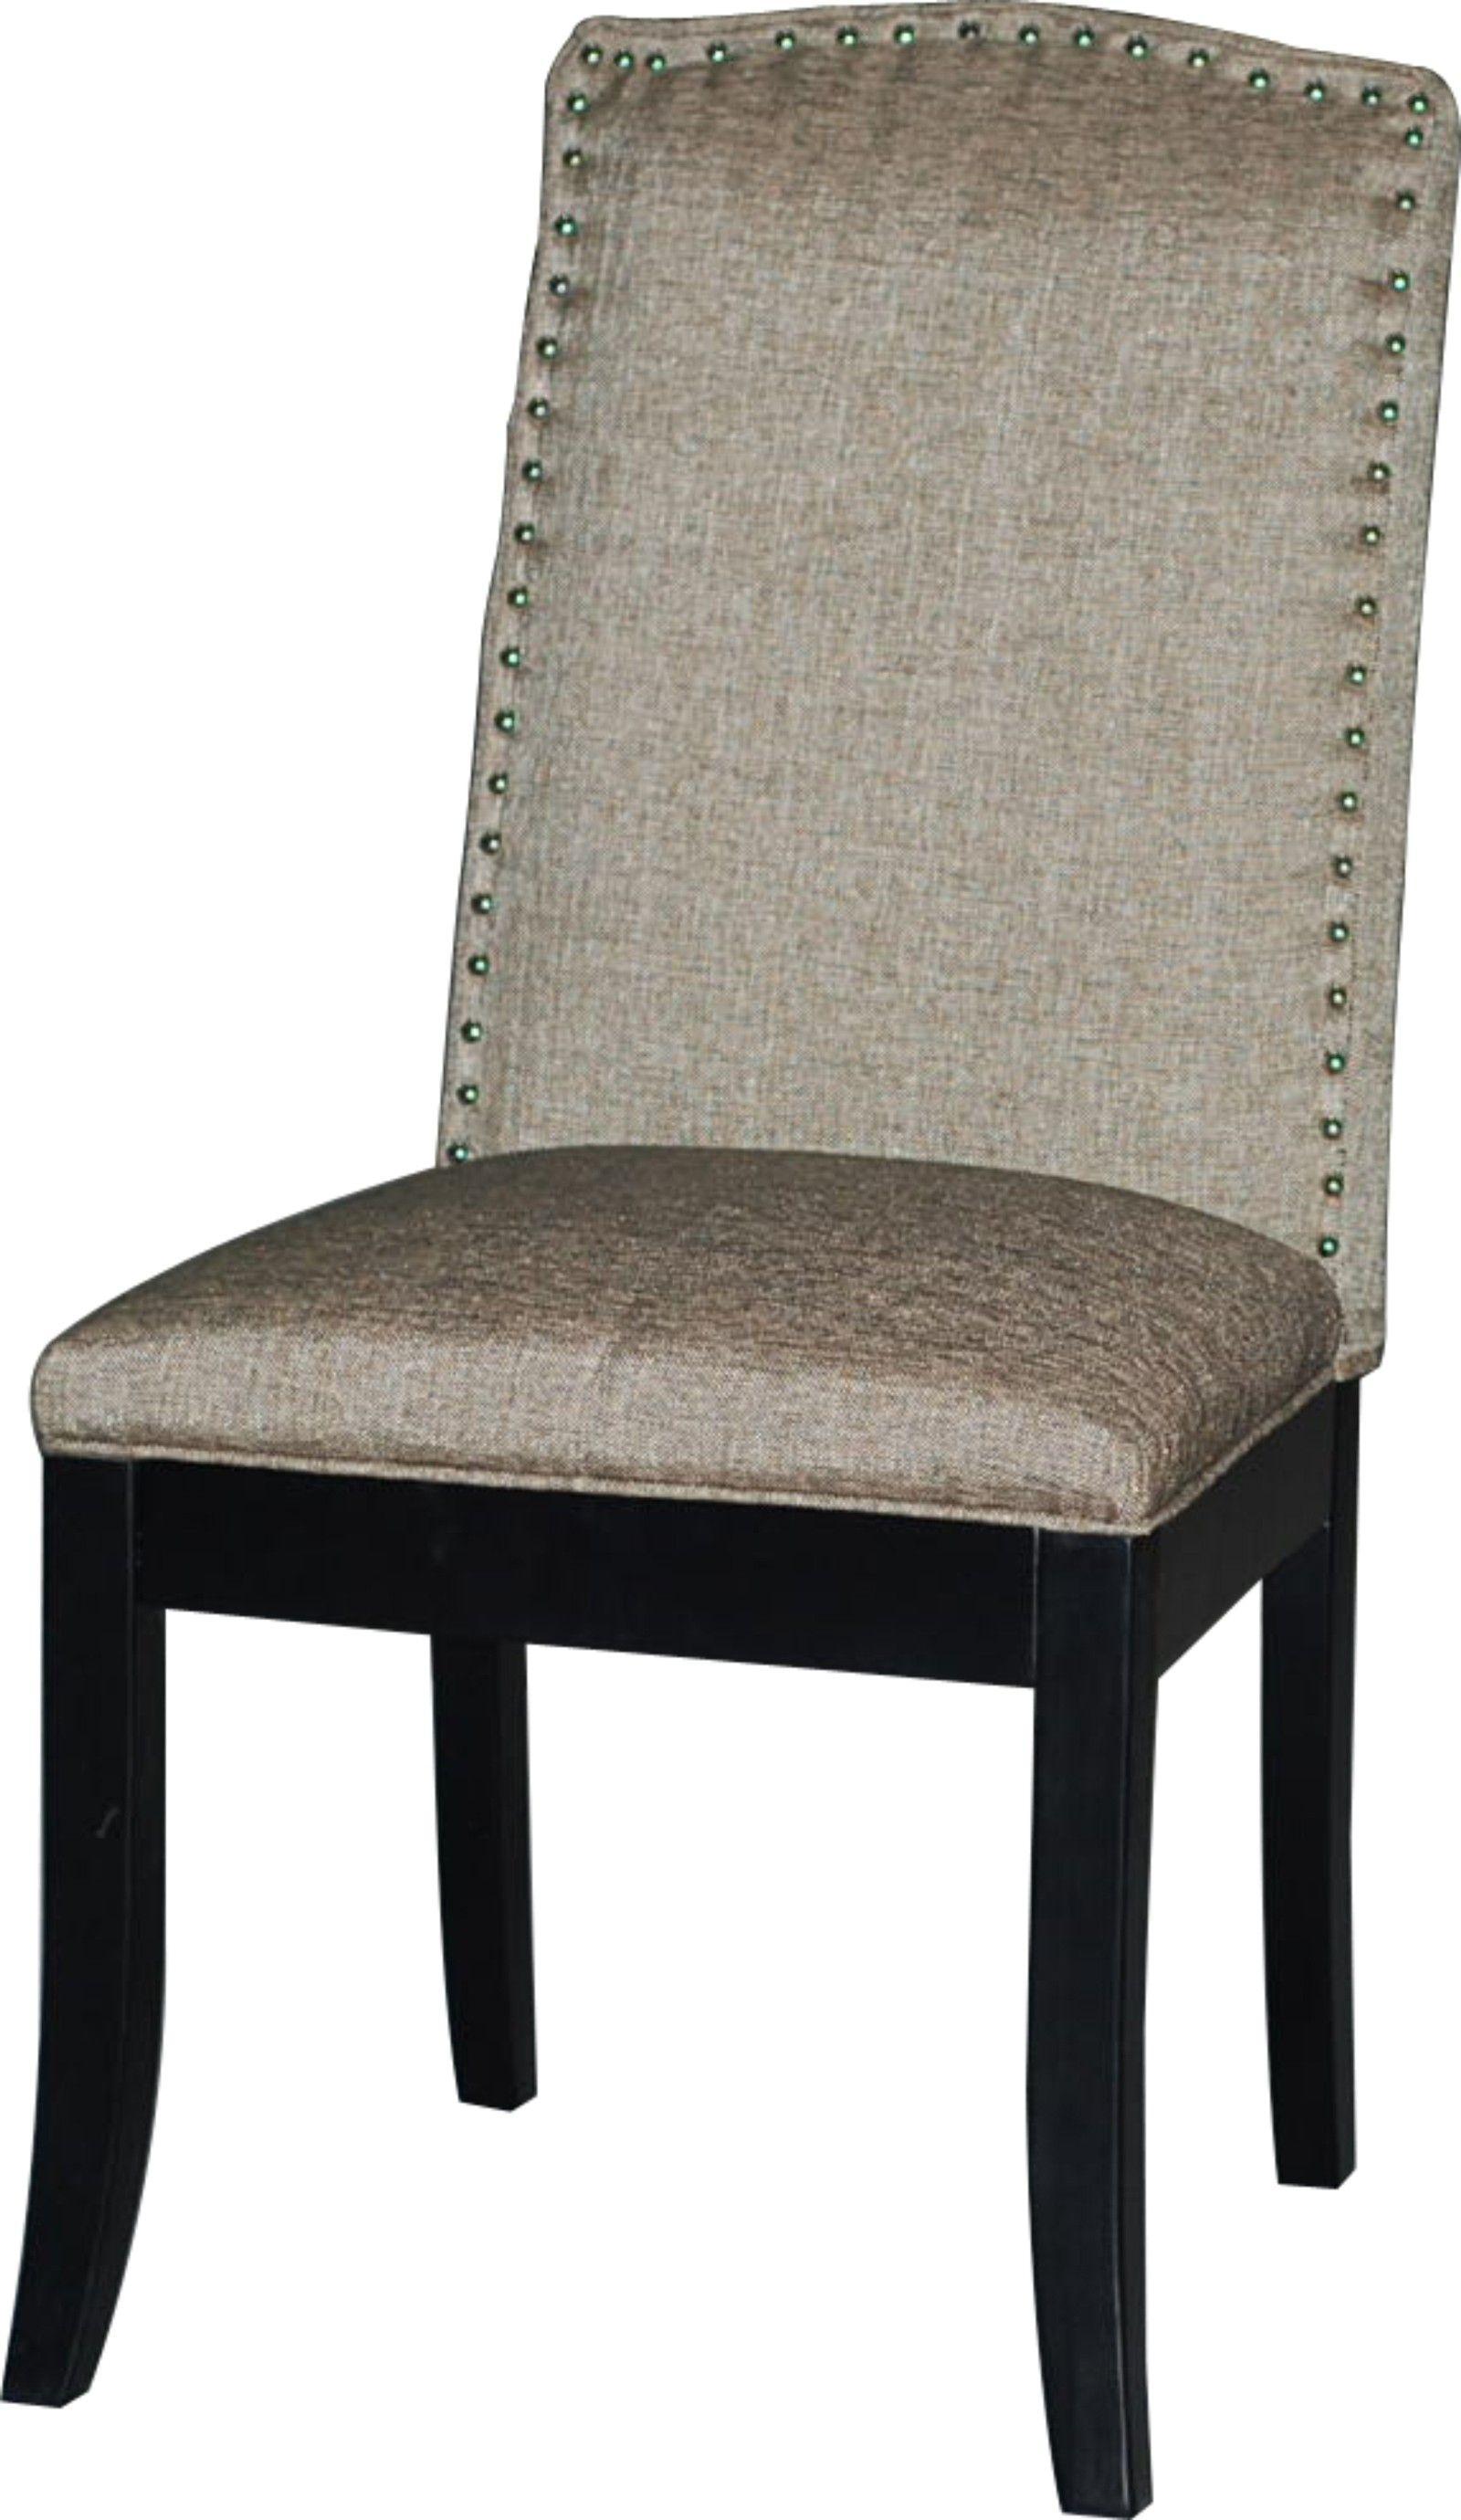 Upholstered Back Side Chair Set Of 2  Decor Diy  Pinterest Adorable Side Chairs Dining Room Design Inspiration